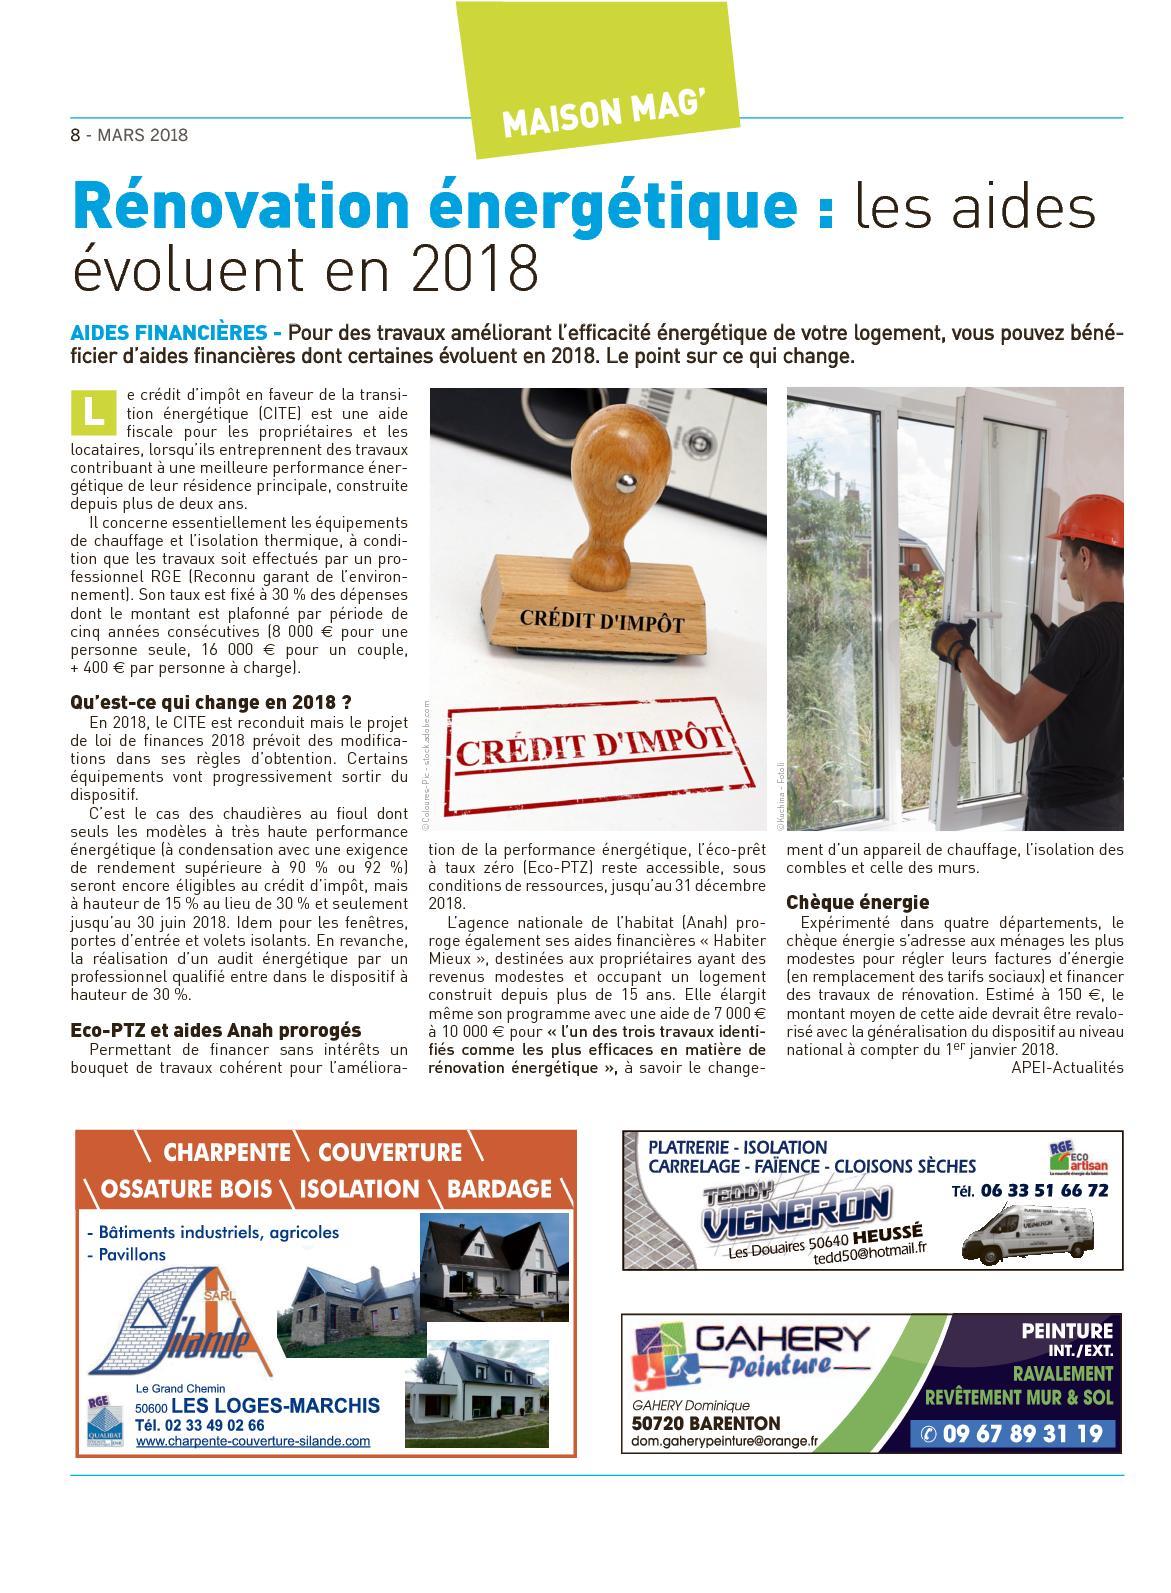 Maison Mag Gazette Manche S13 Calameo Downloader